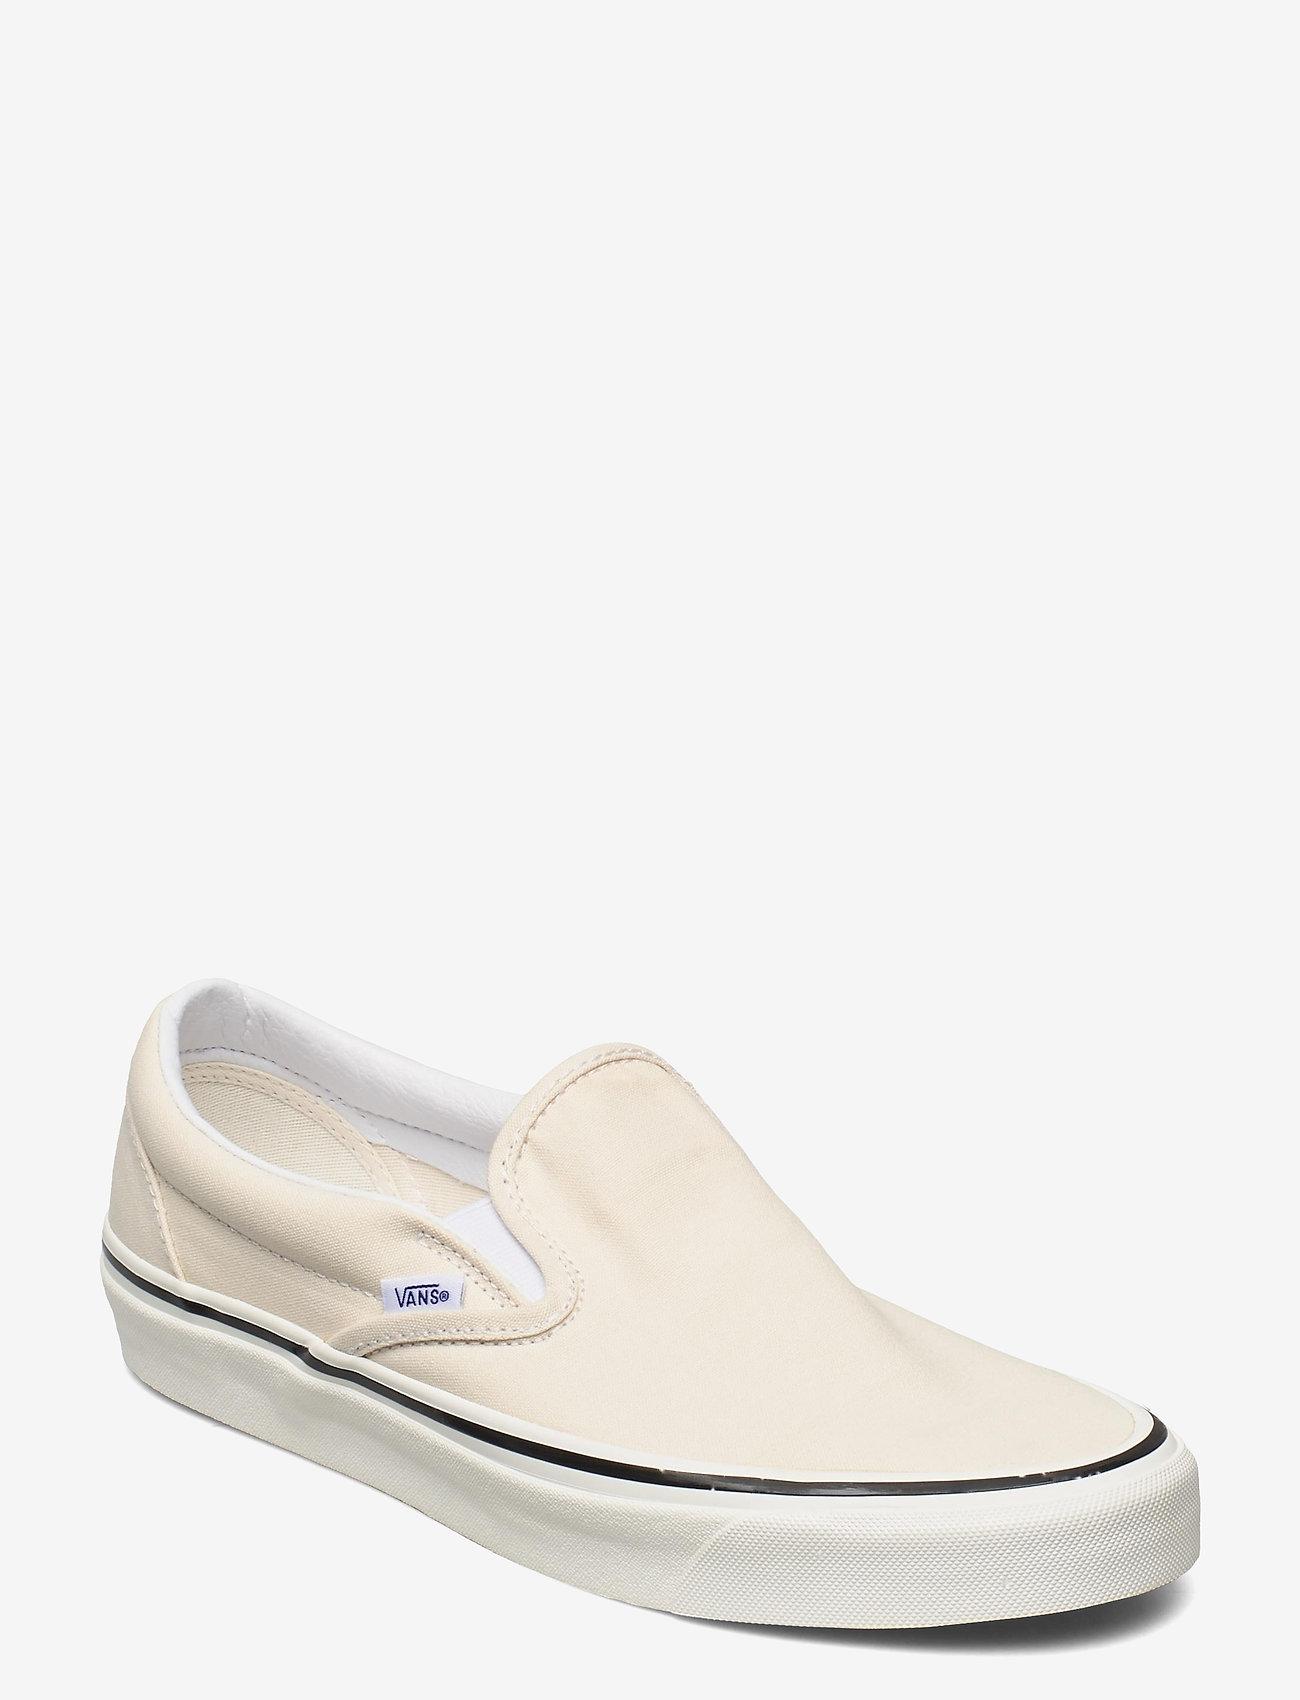 VANS - Shoe Adult Unisex Numeric Wid - slip-on schoenen - (anaheim factory)og white - 0